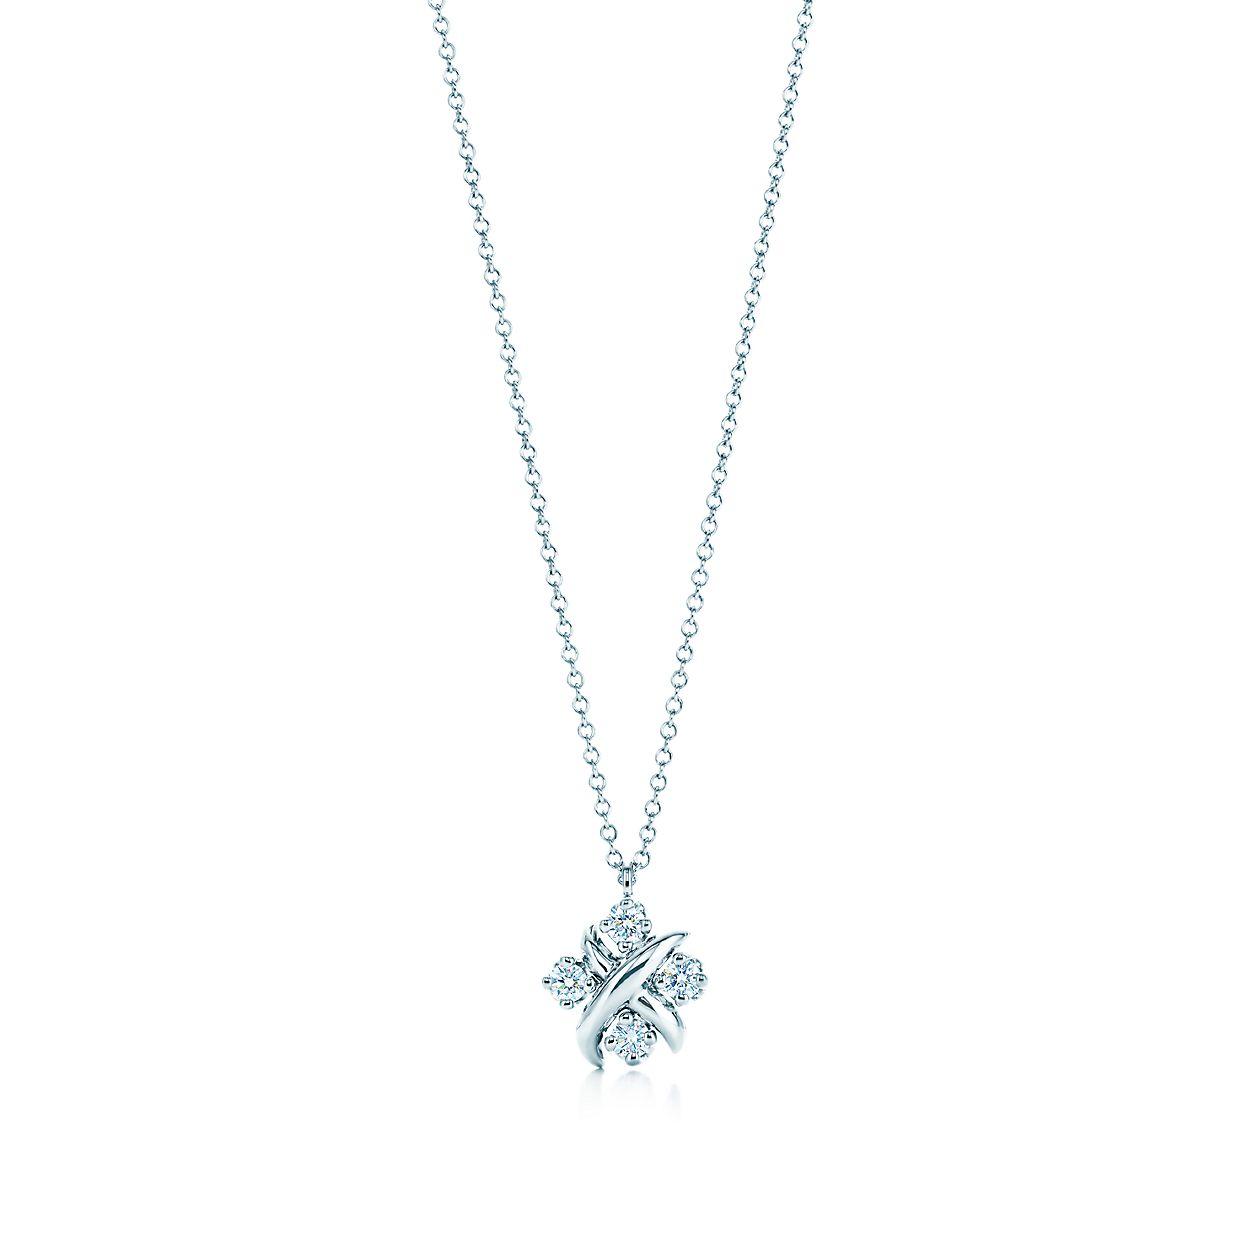 f549eab56 Tiffany & Co. Schlumberger Lynn pendant in platinum with diamonds ...